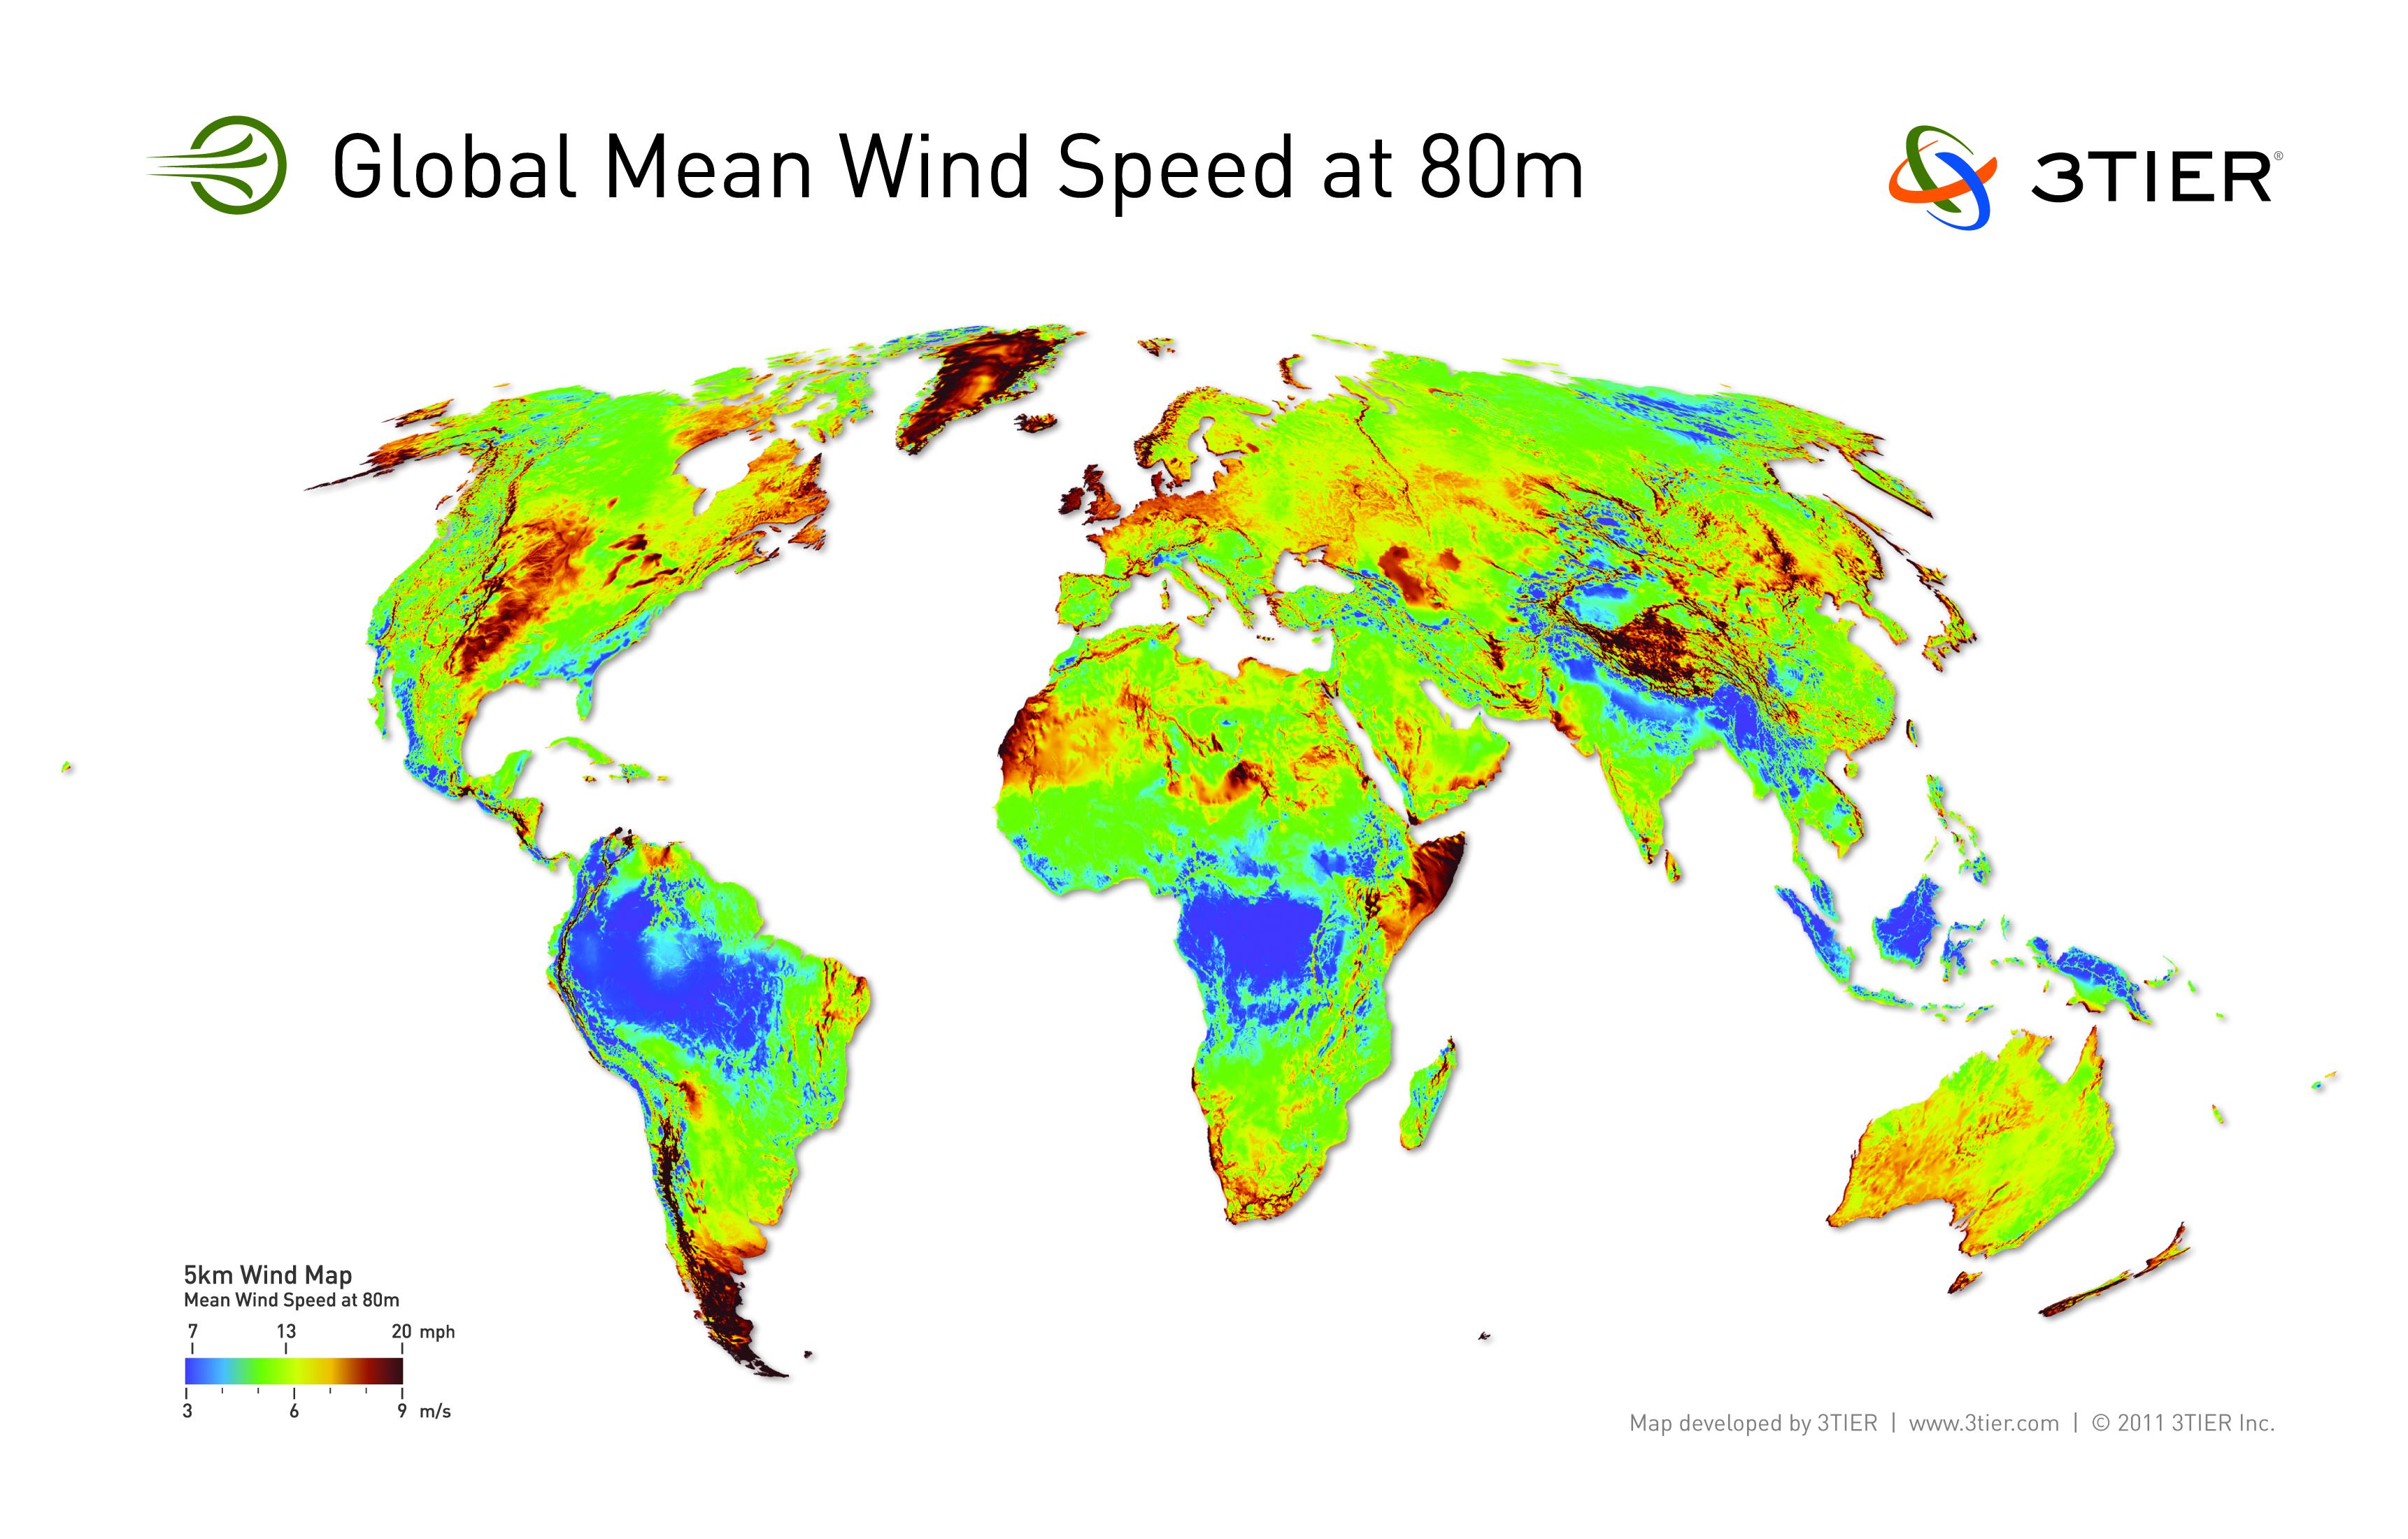 worksheet Global Wind Patterns Worksheet global wind map world 07 patterns our atmosphere rocks email thisblogthis